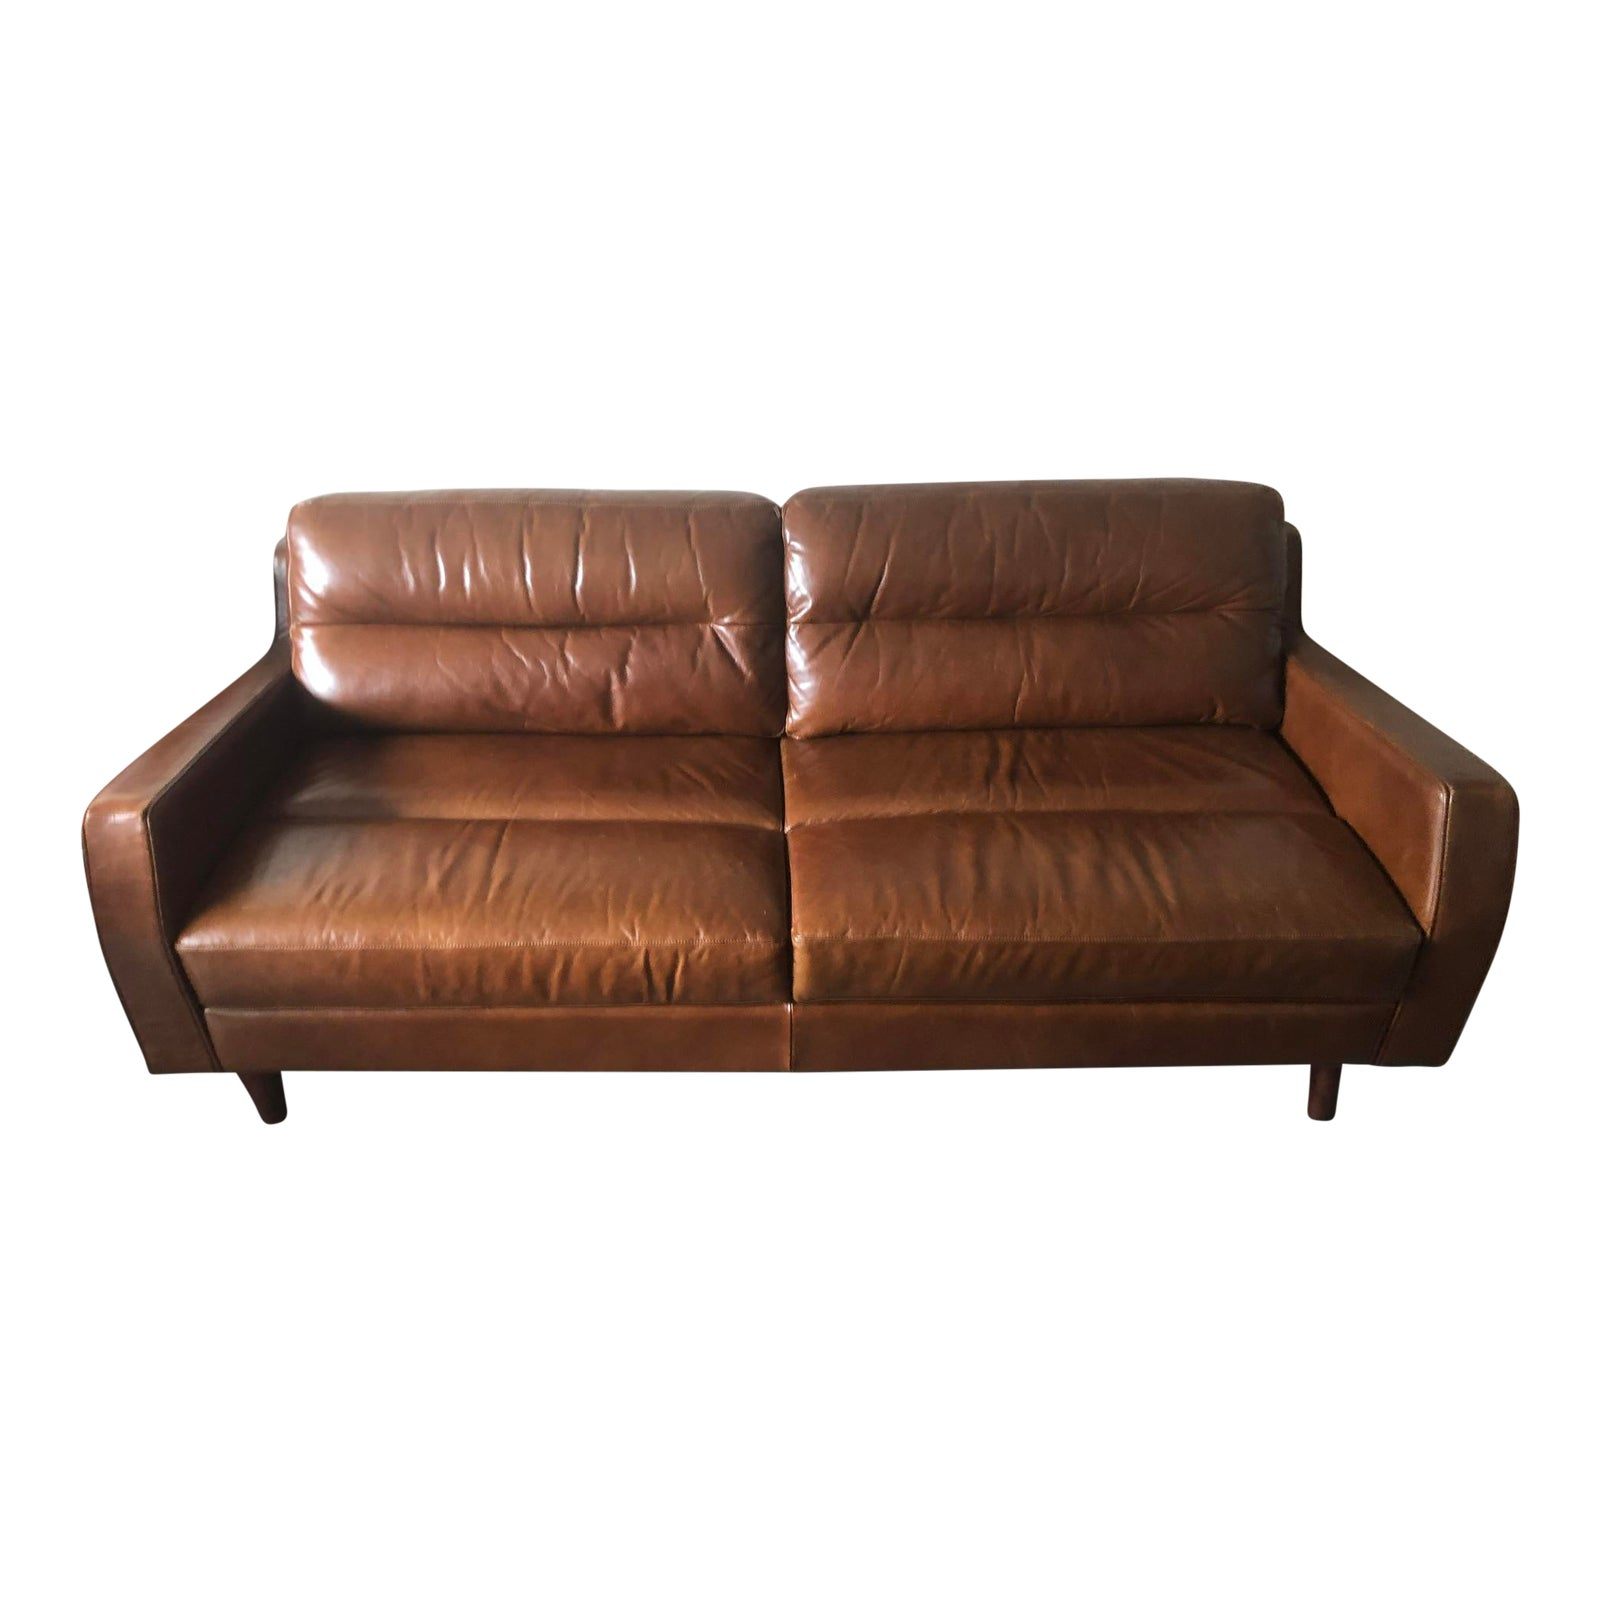 Moroni Contemporary Leather Sofa